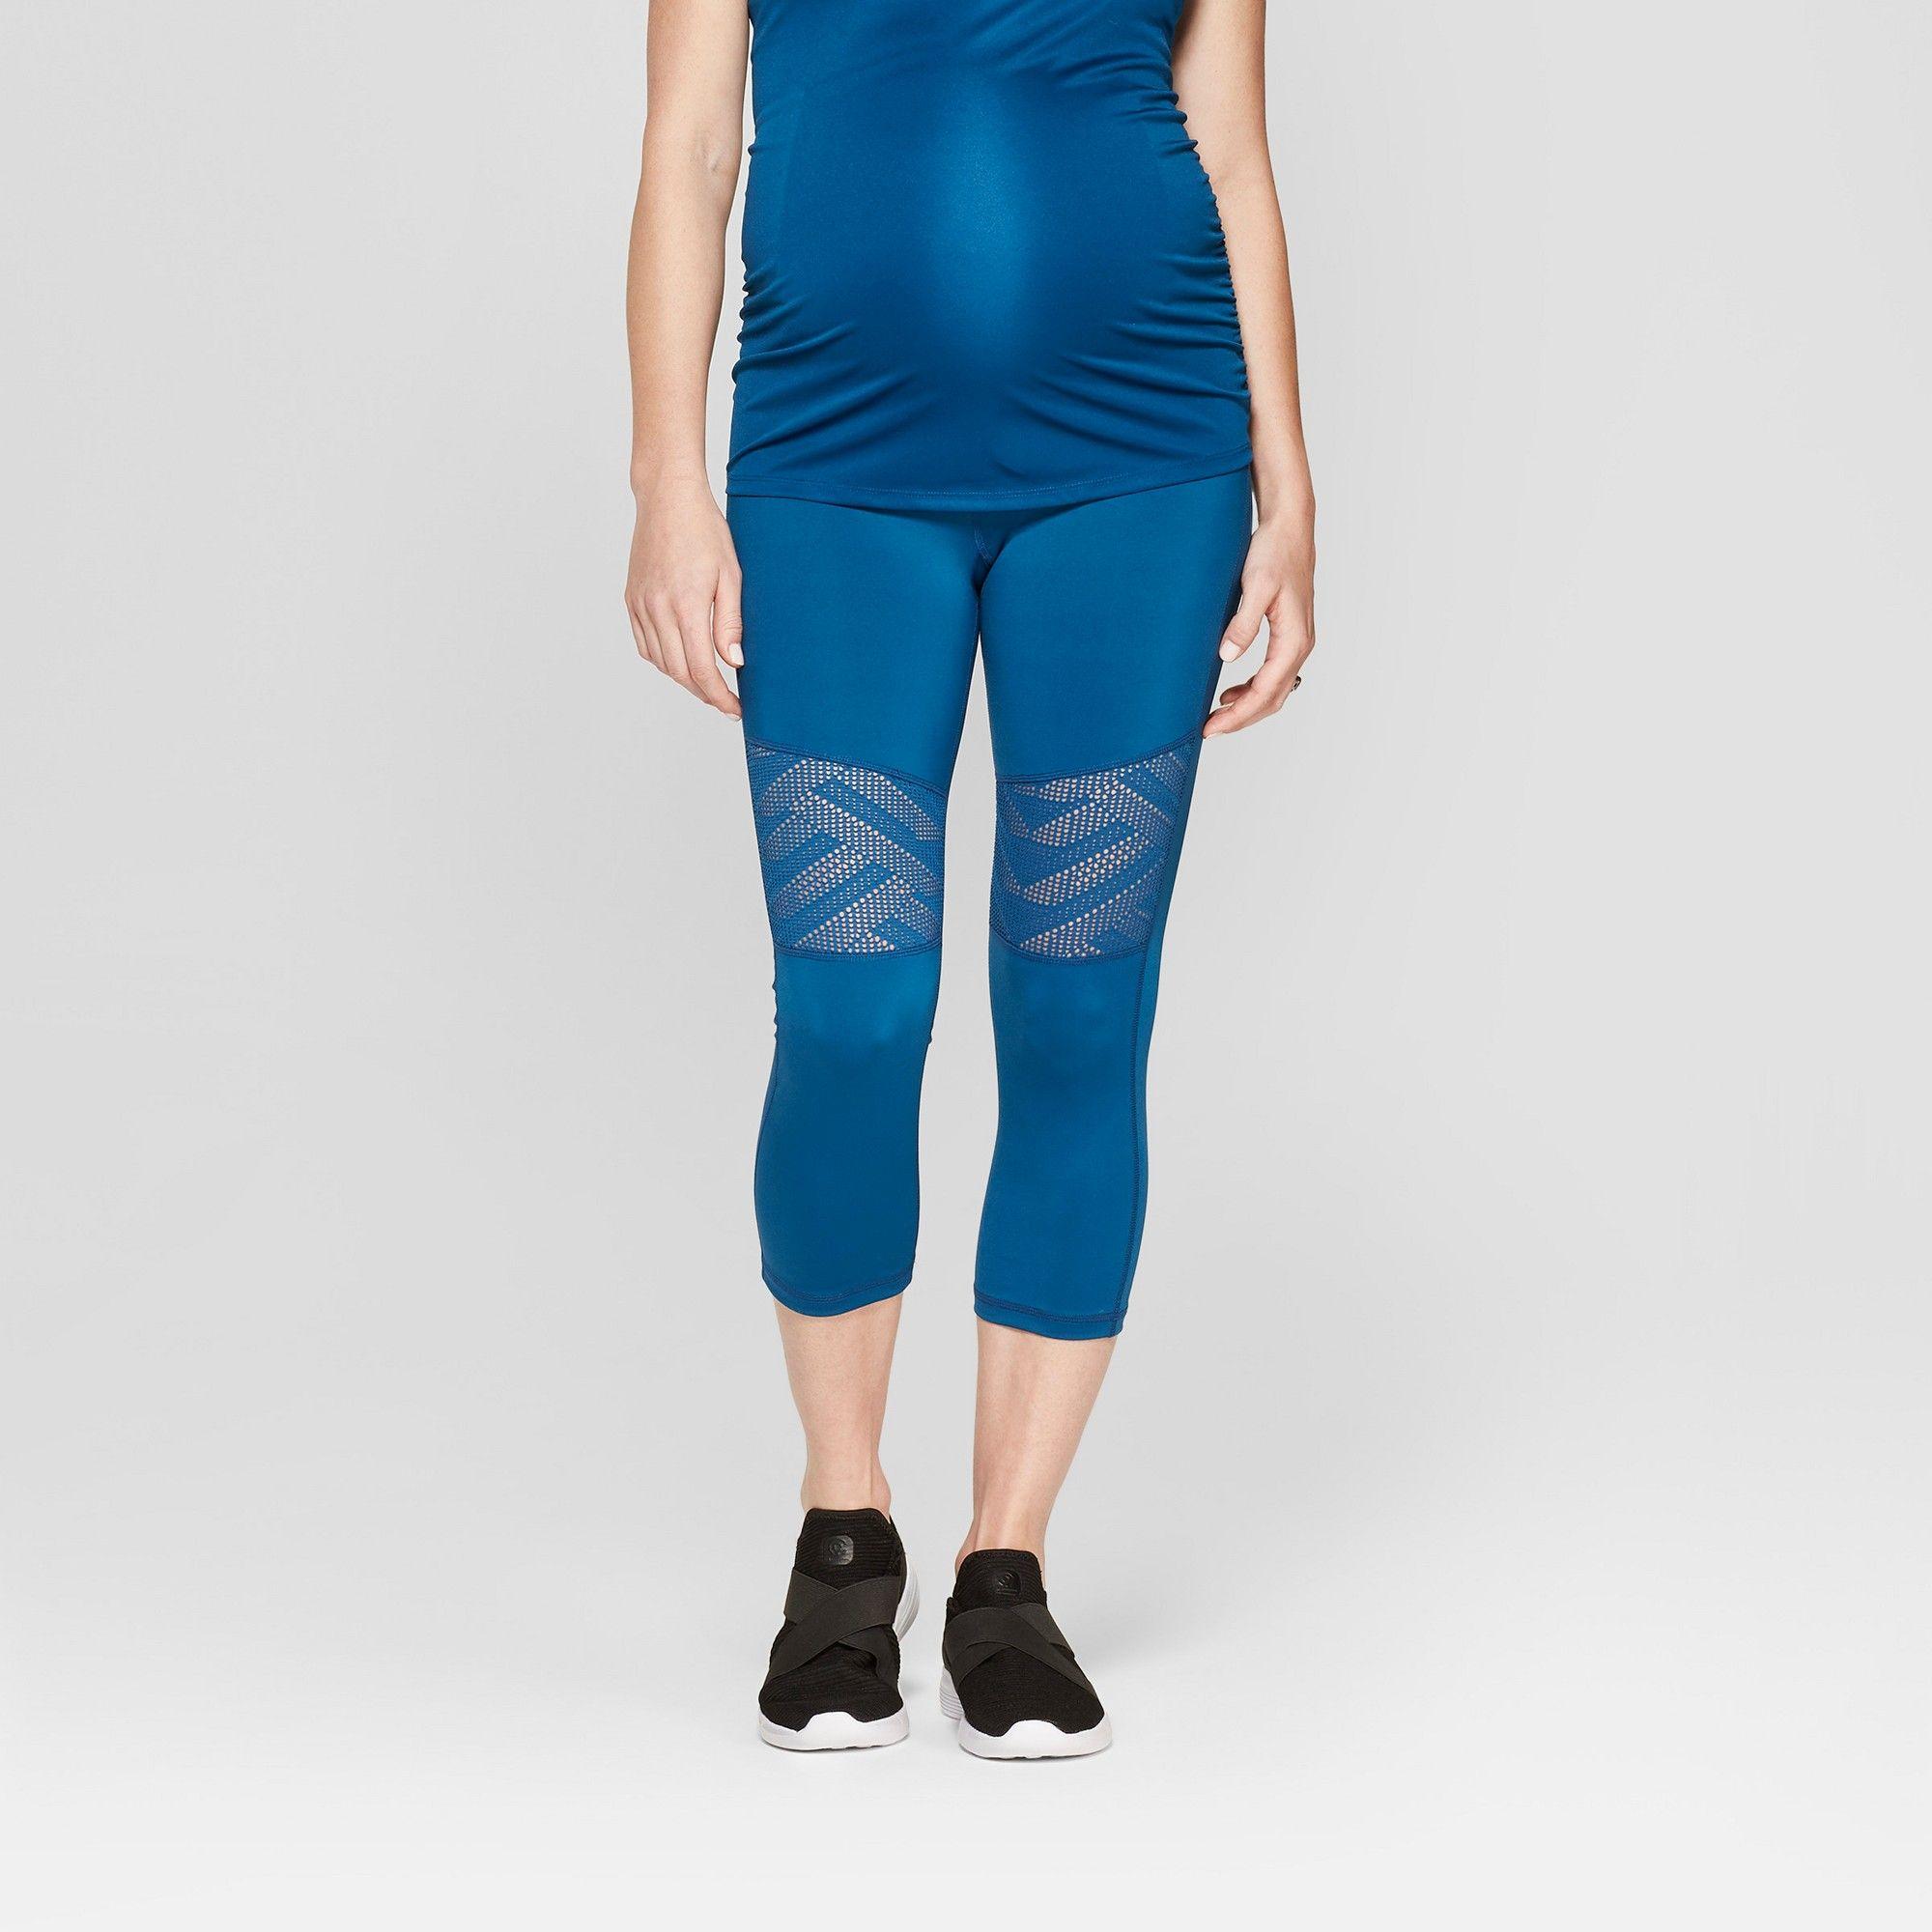 ae571efd5798b5 Maternity Active Geo Mesh Capri Leggings - Isabel Maternity by Ingrid &  Isabel Saphire Burst Blue M, Women's